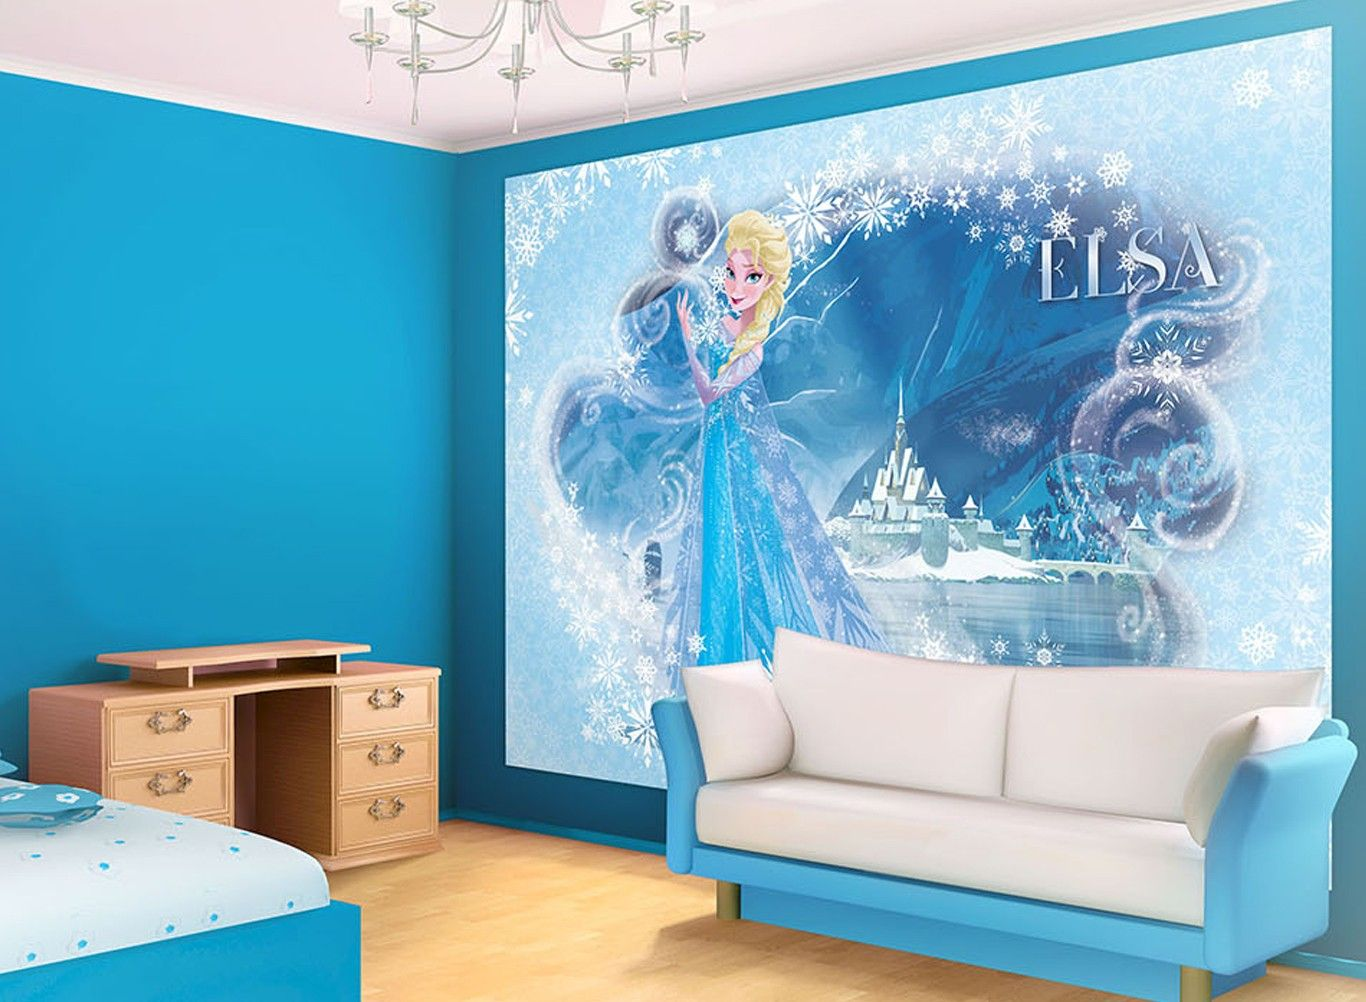 Elsa Frozen Disney wallpaper mural